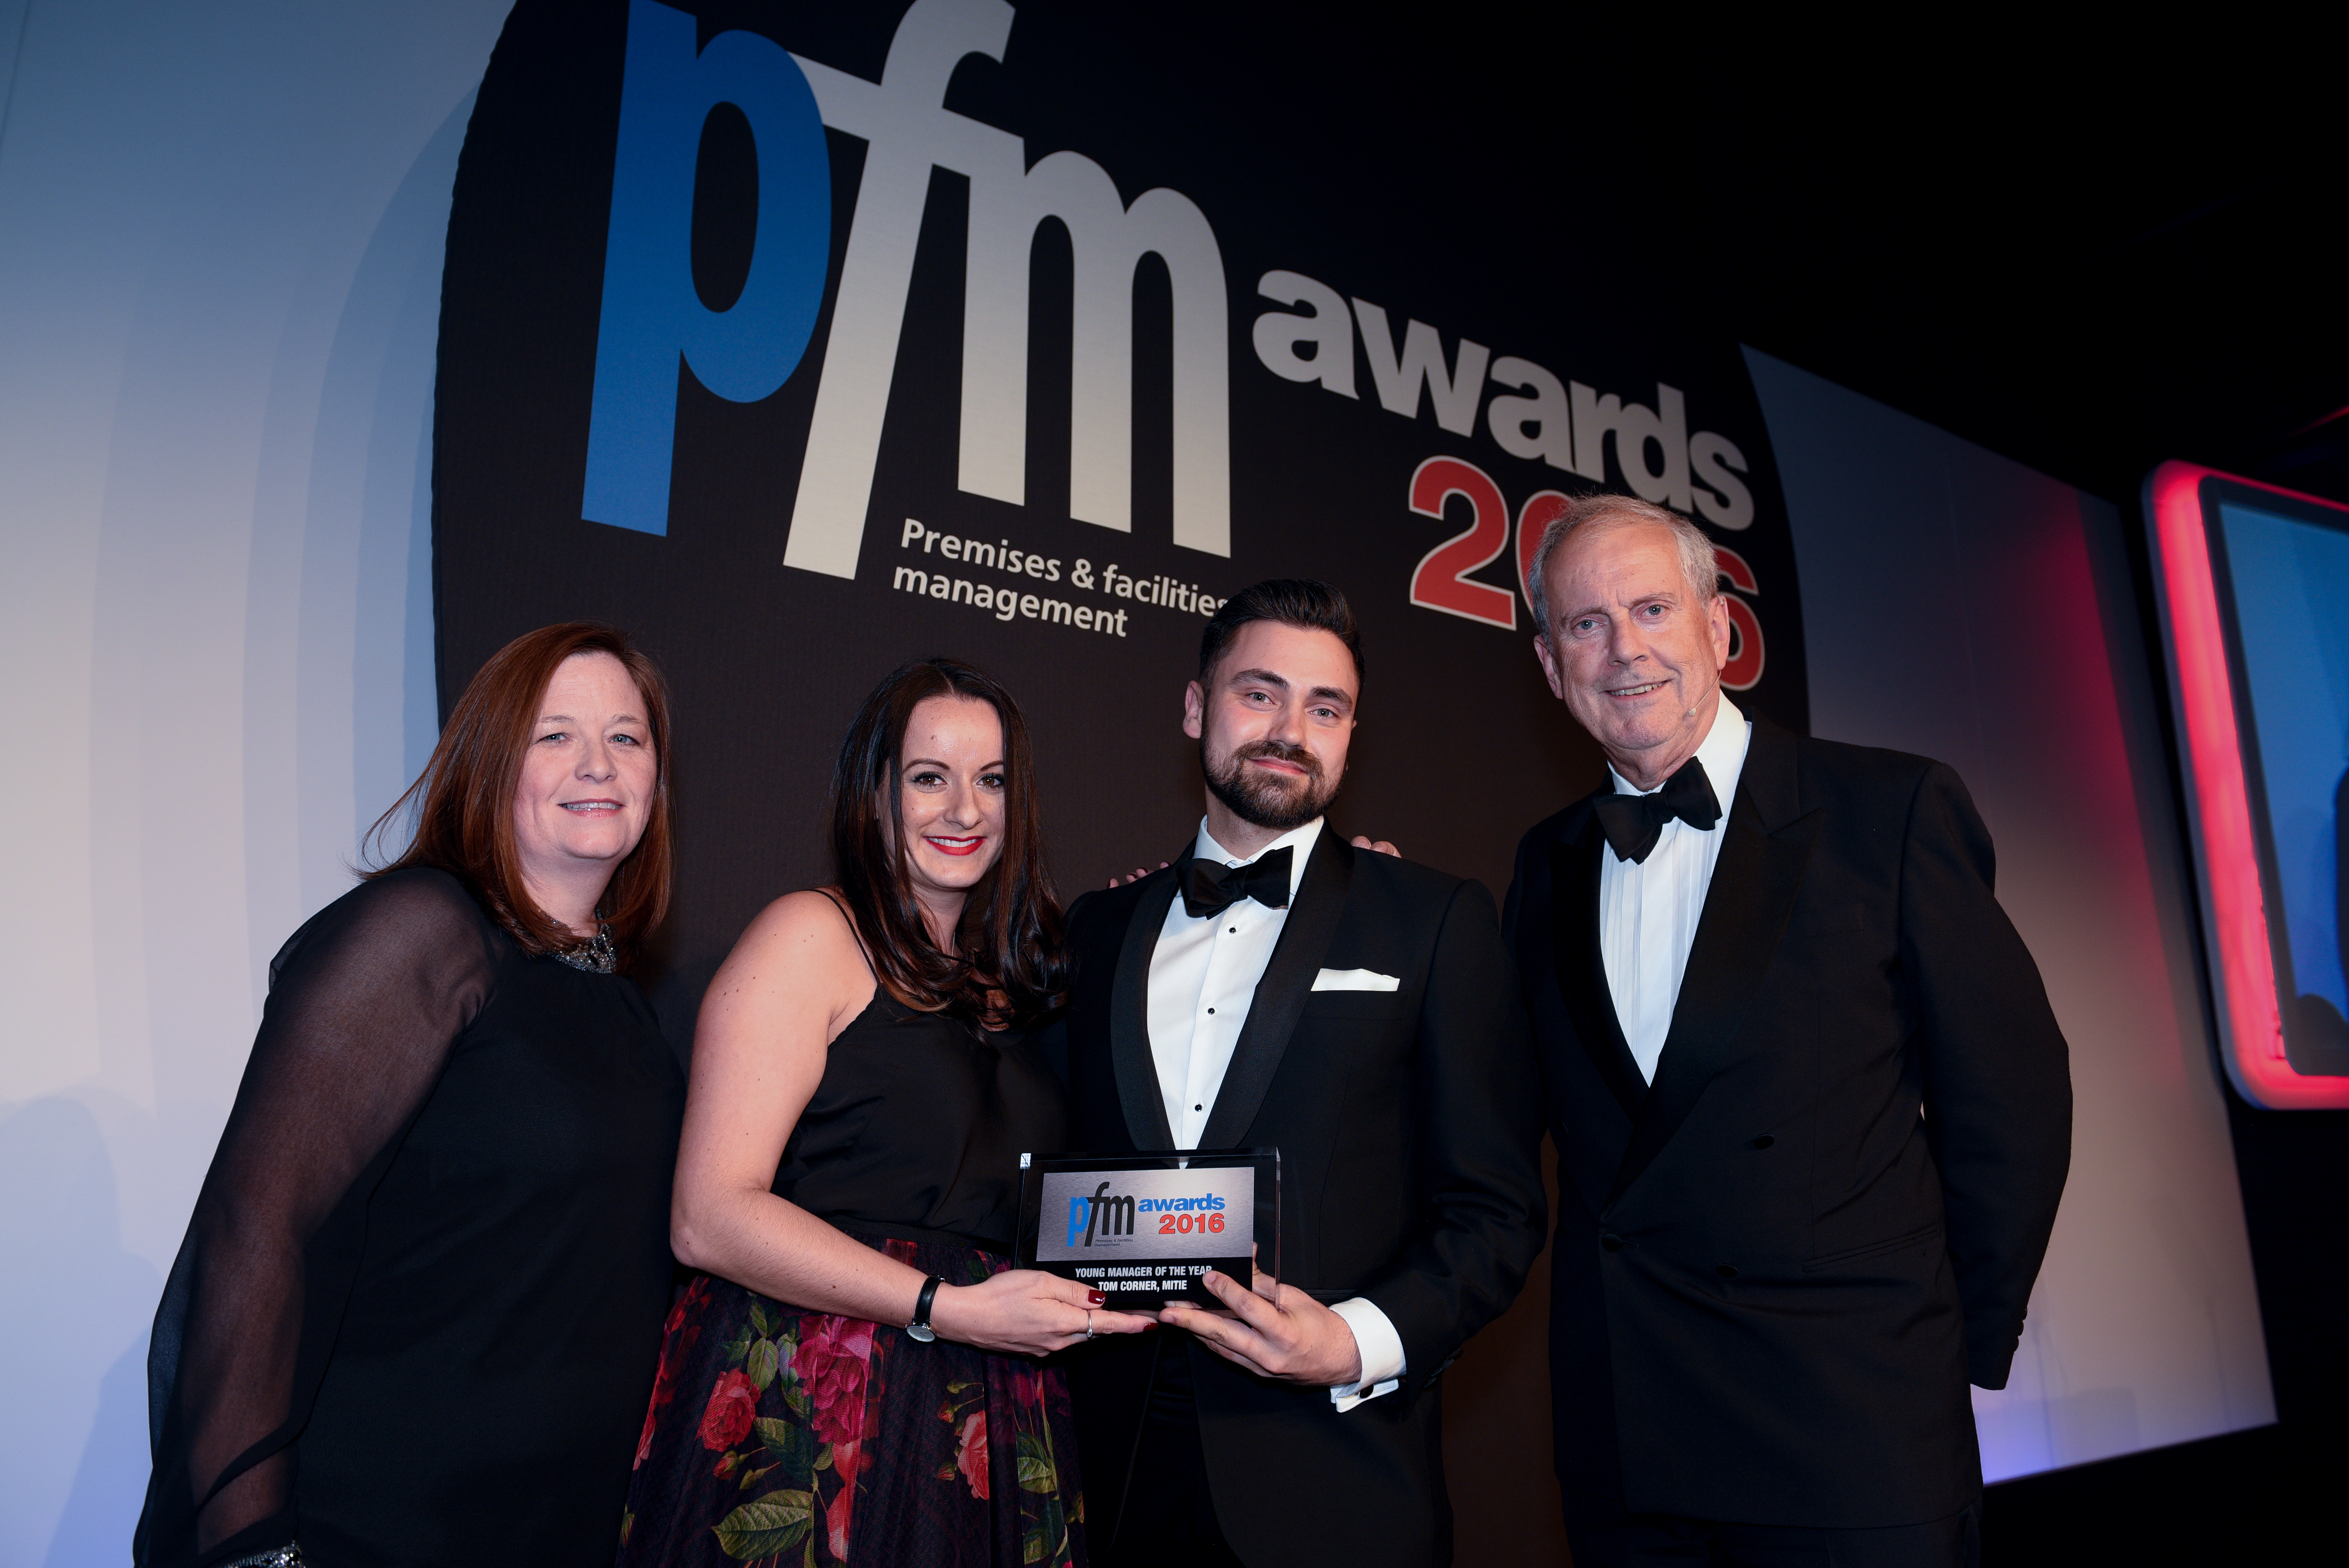 PFM Awards 2/11/16